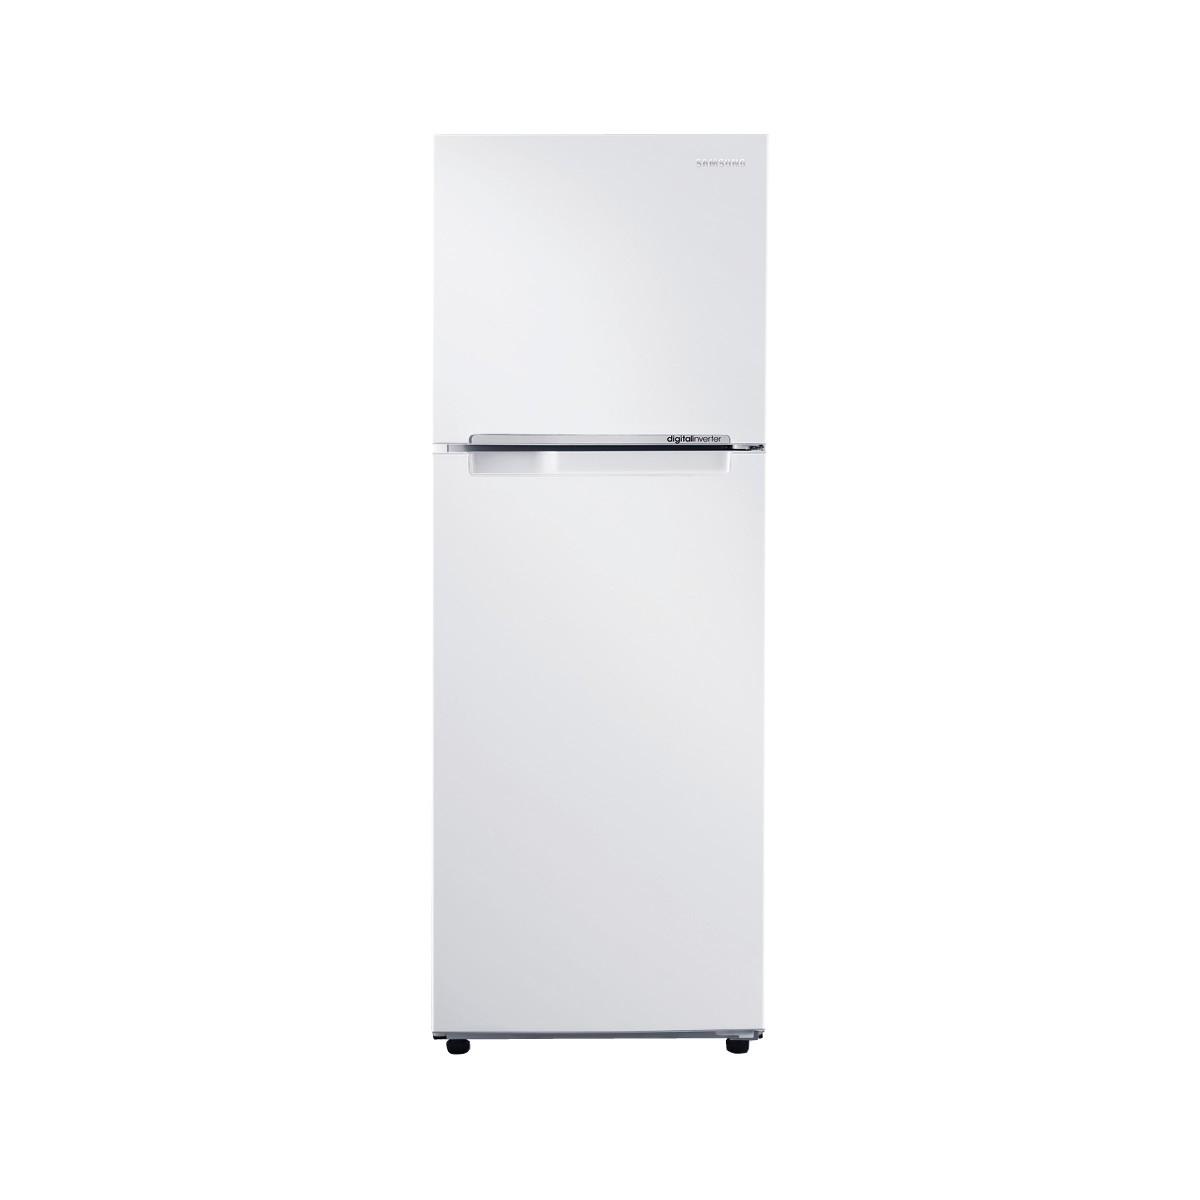 Samsung 254l Top Mount Fridge White Buy Online